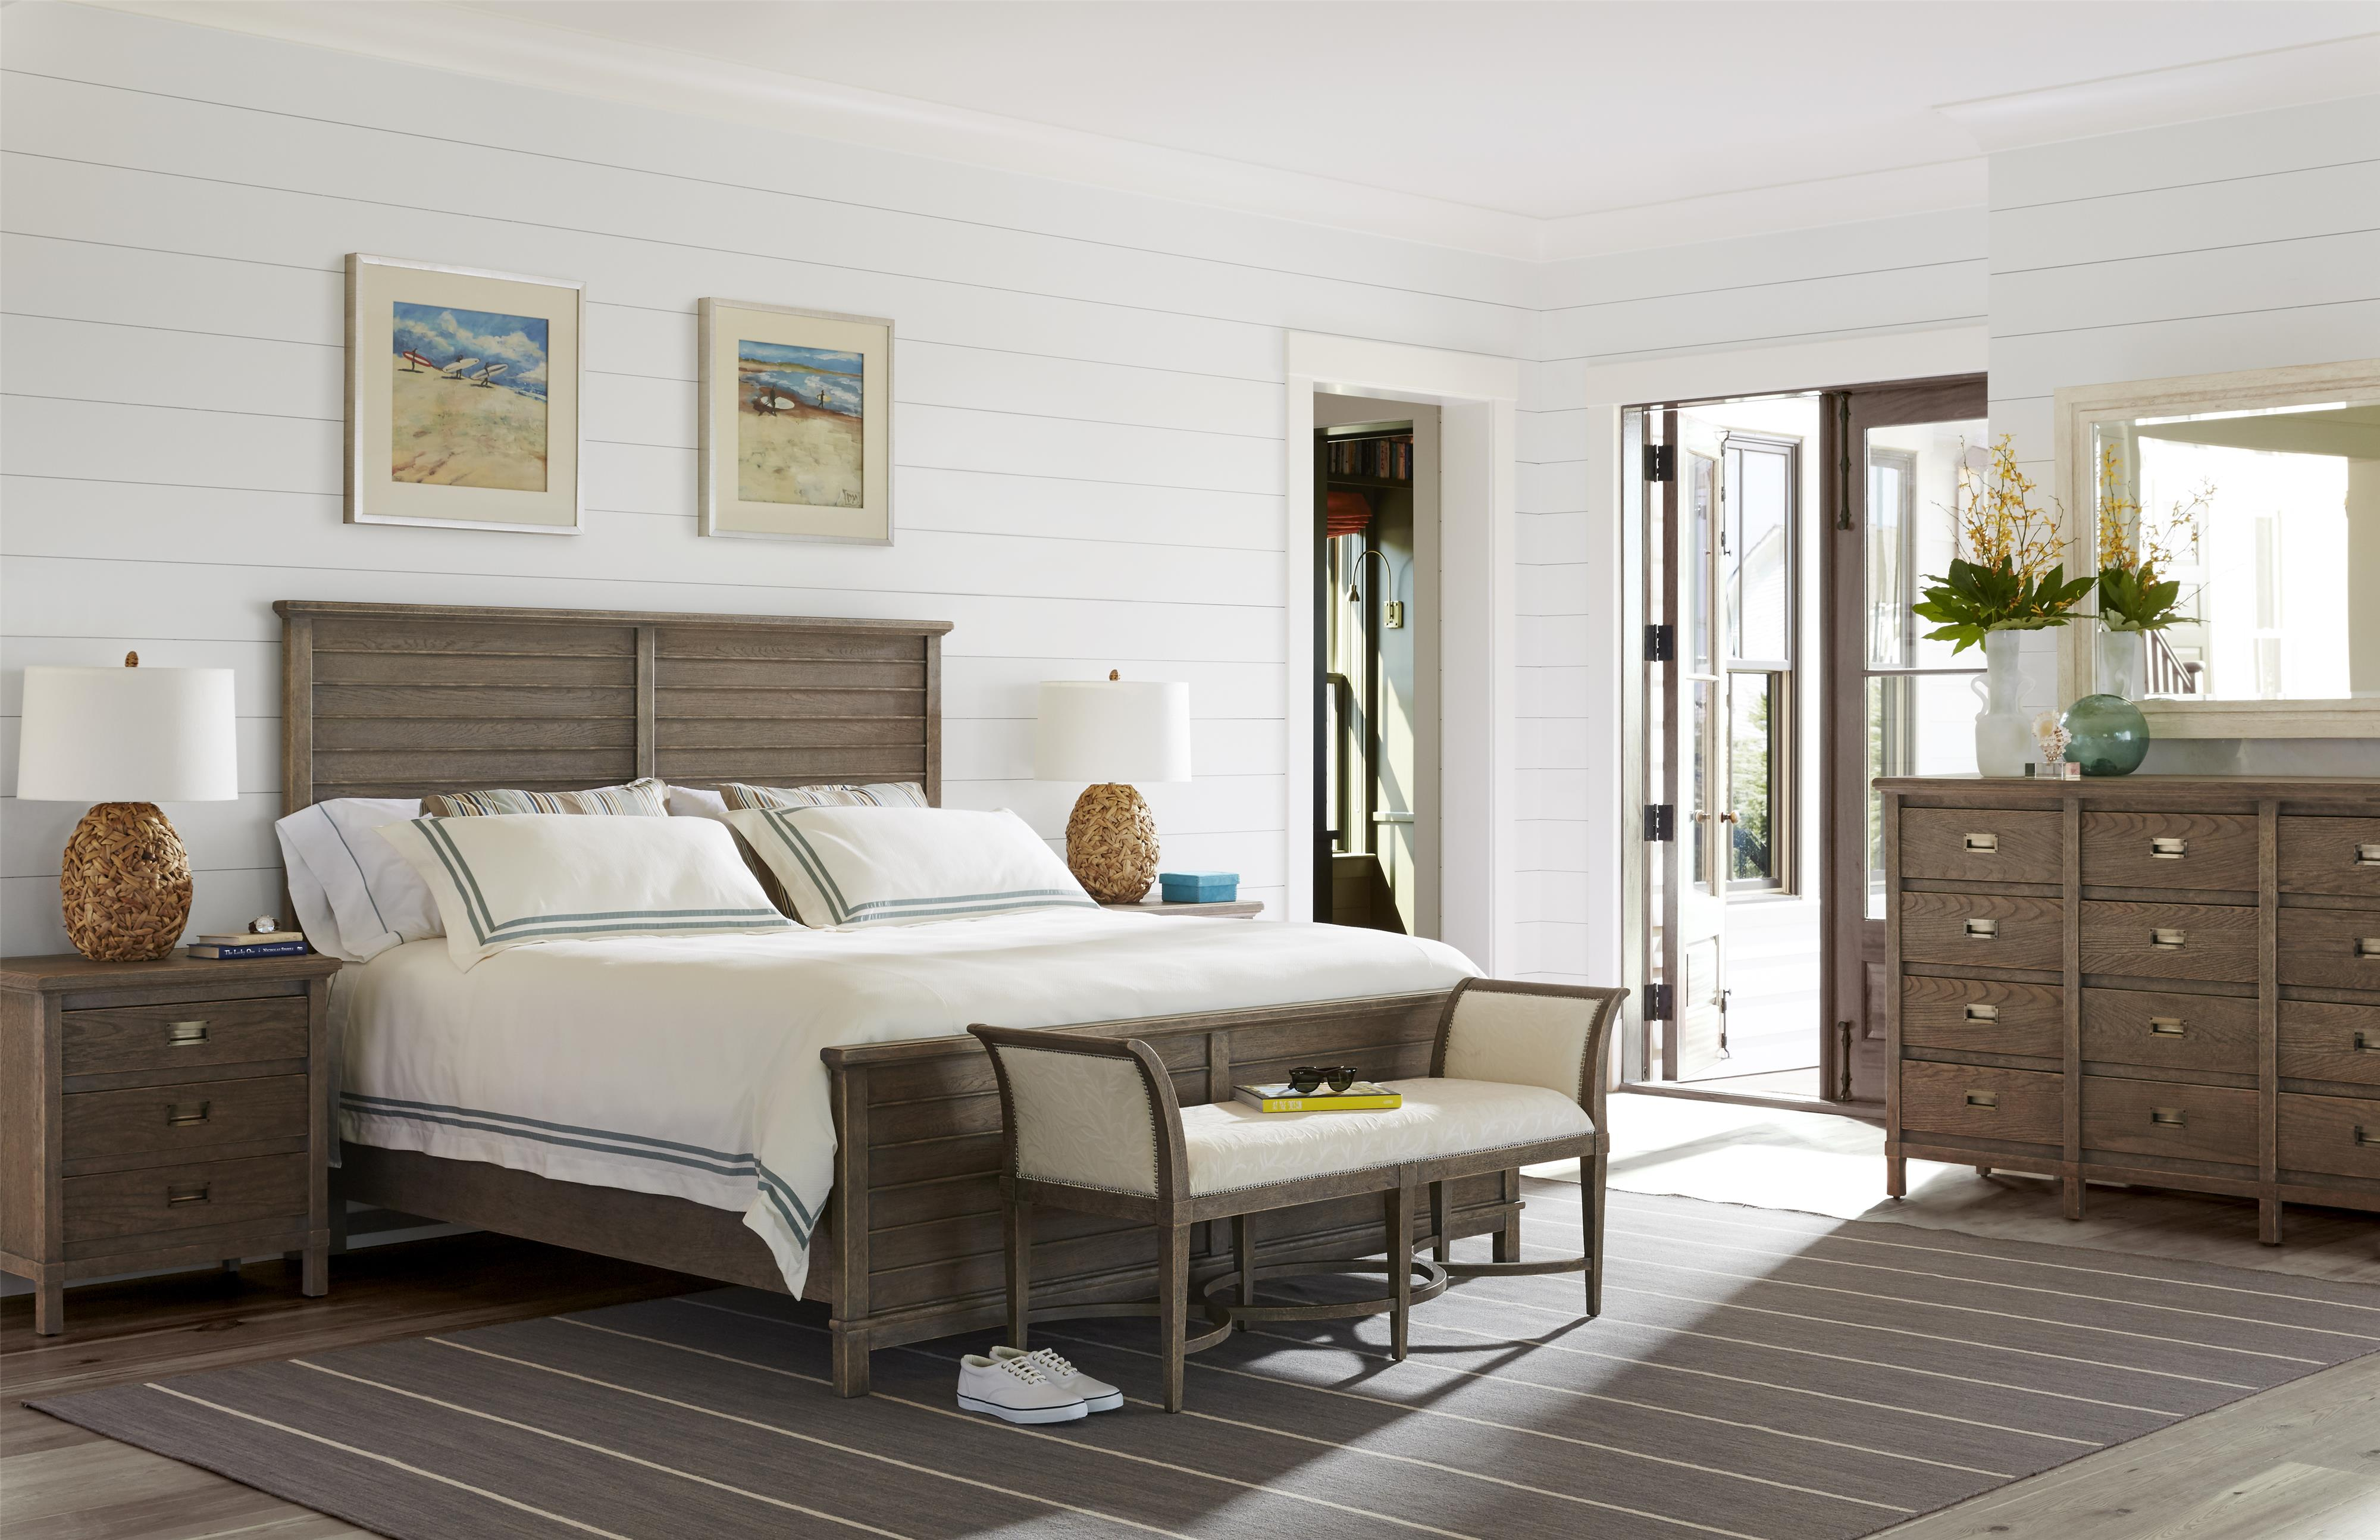 stanley furniture coastal living resort king water meadow woven